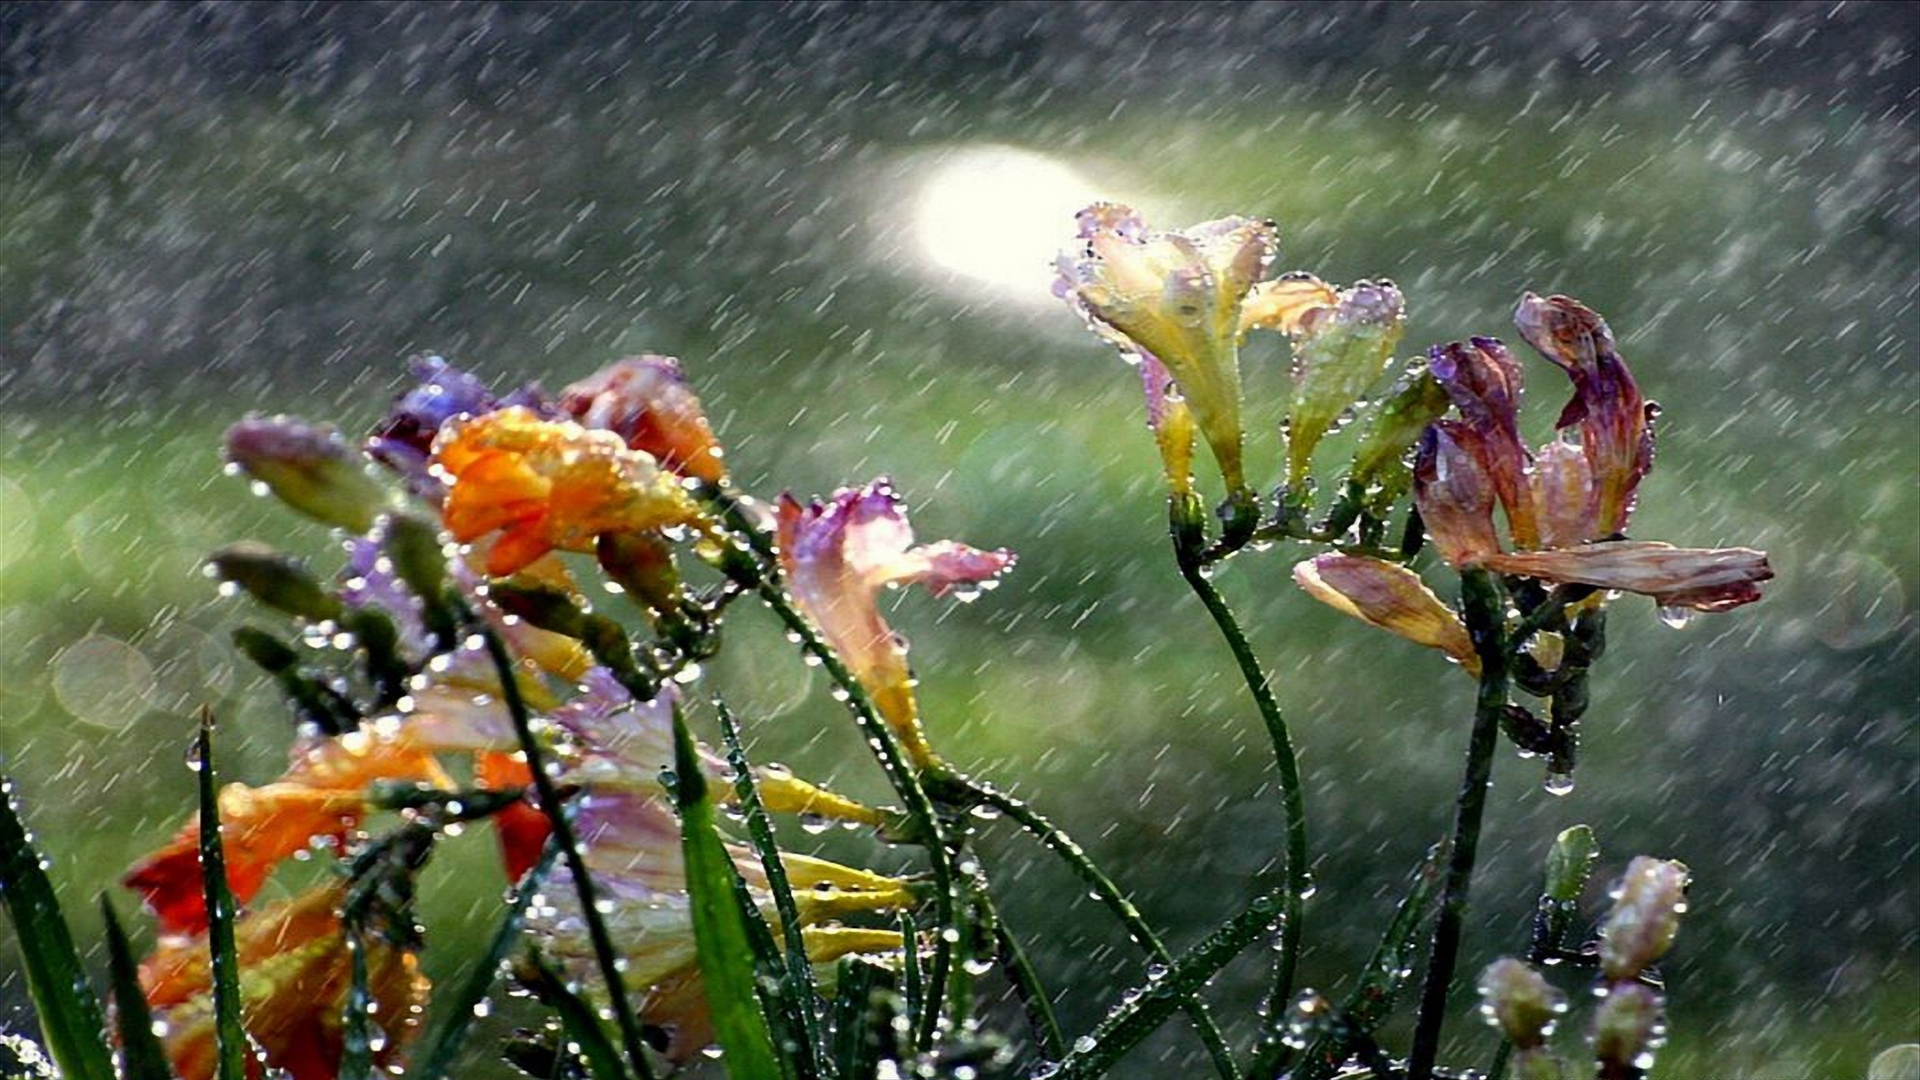 uploads downloadRainy day and Rain wallpaper 1920X1080 pixels 7jpg 1920x1080